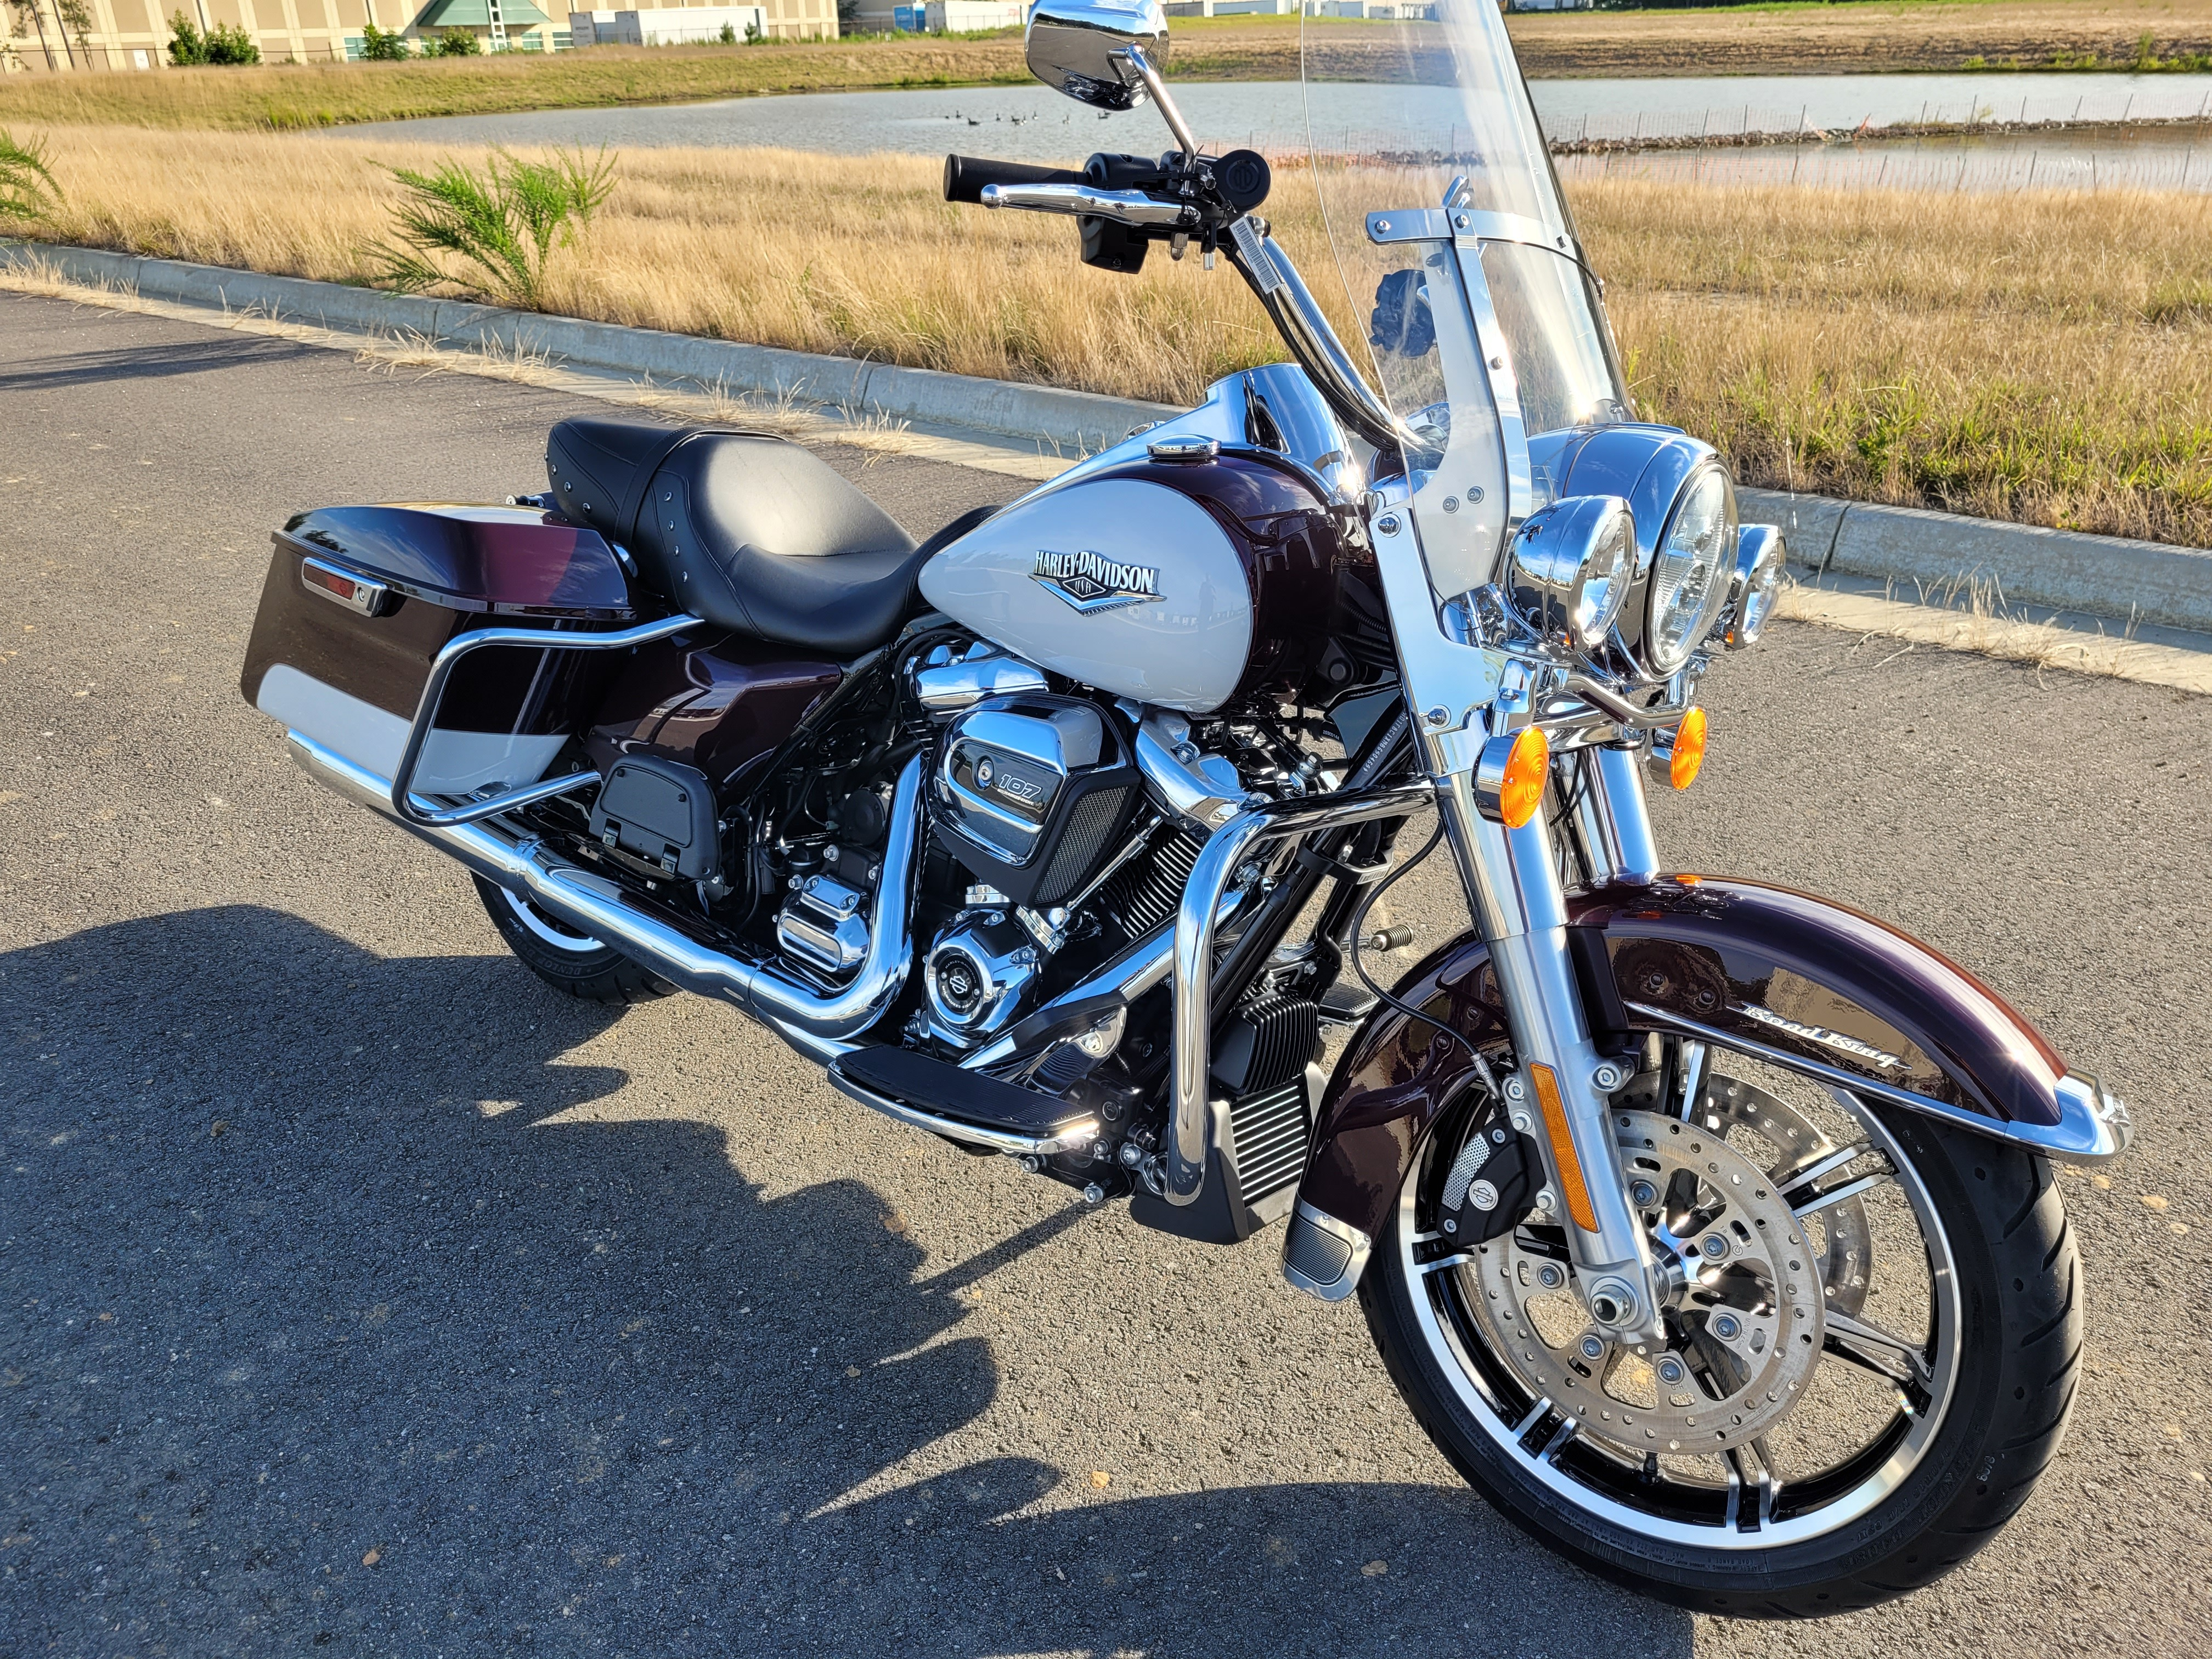 2021 Harley-Davidson Touring Road King at Richmond Harley-Davidson